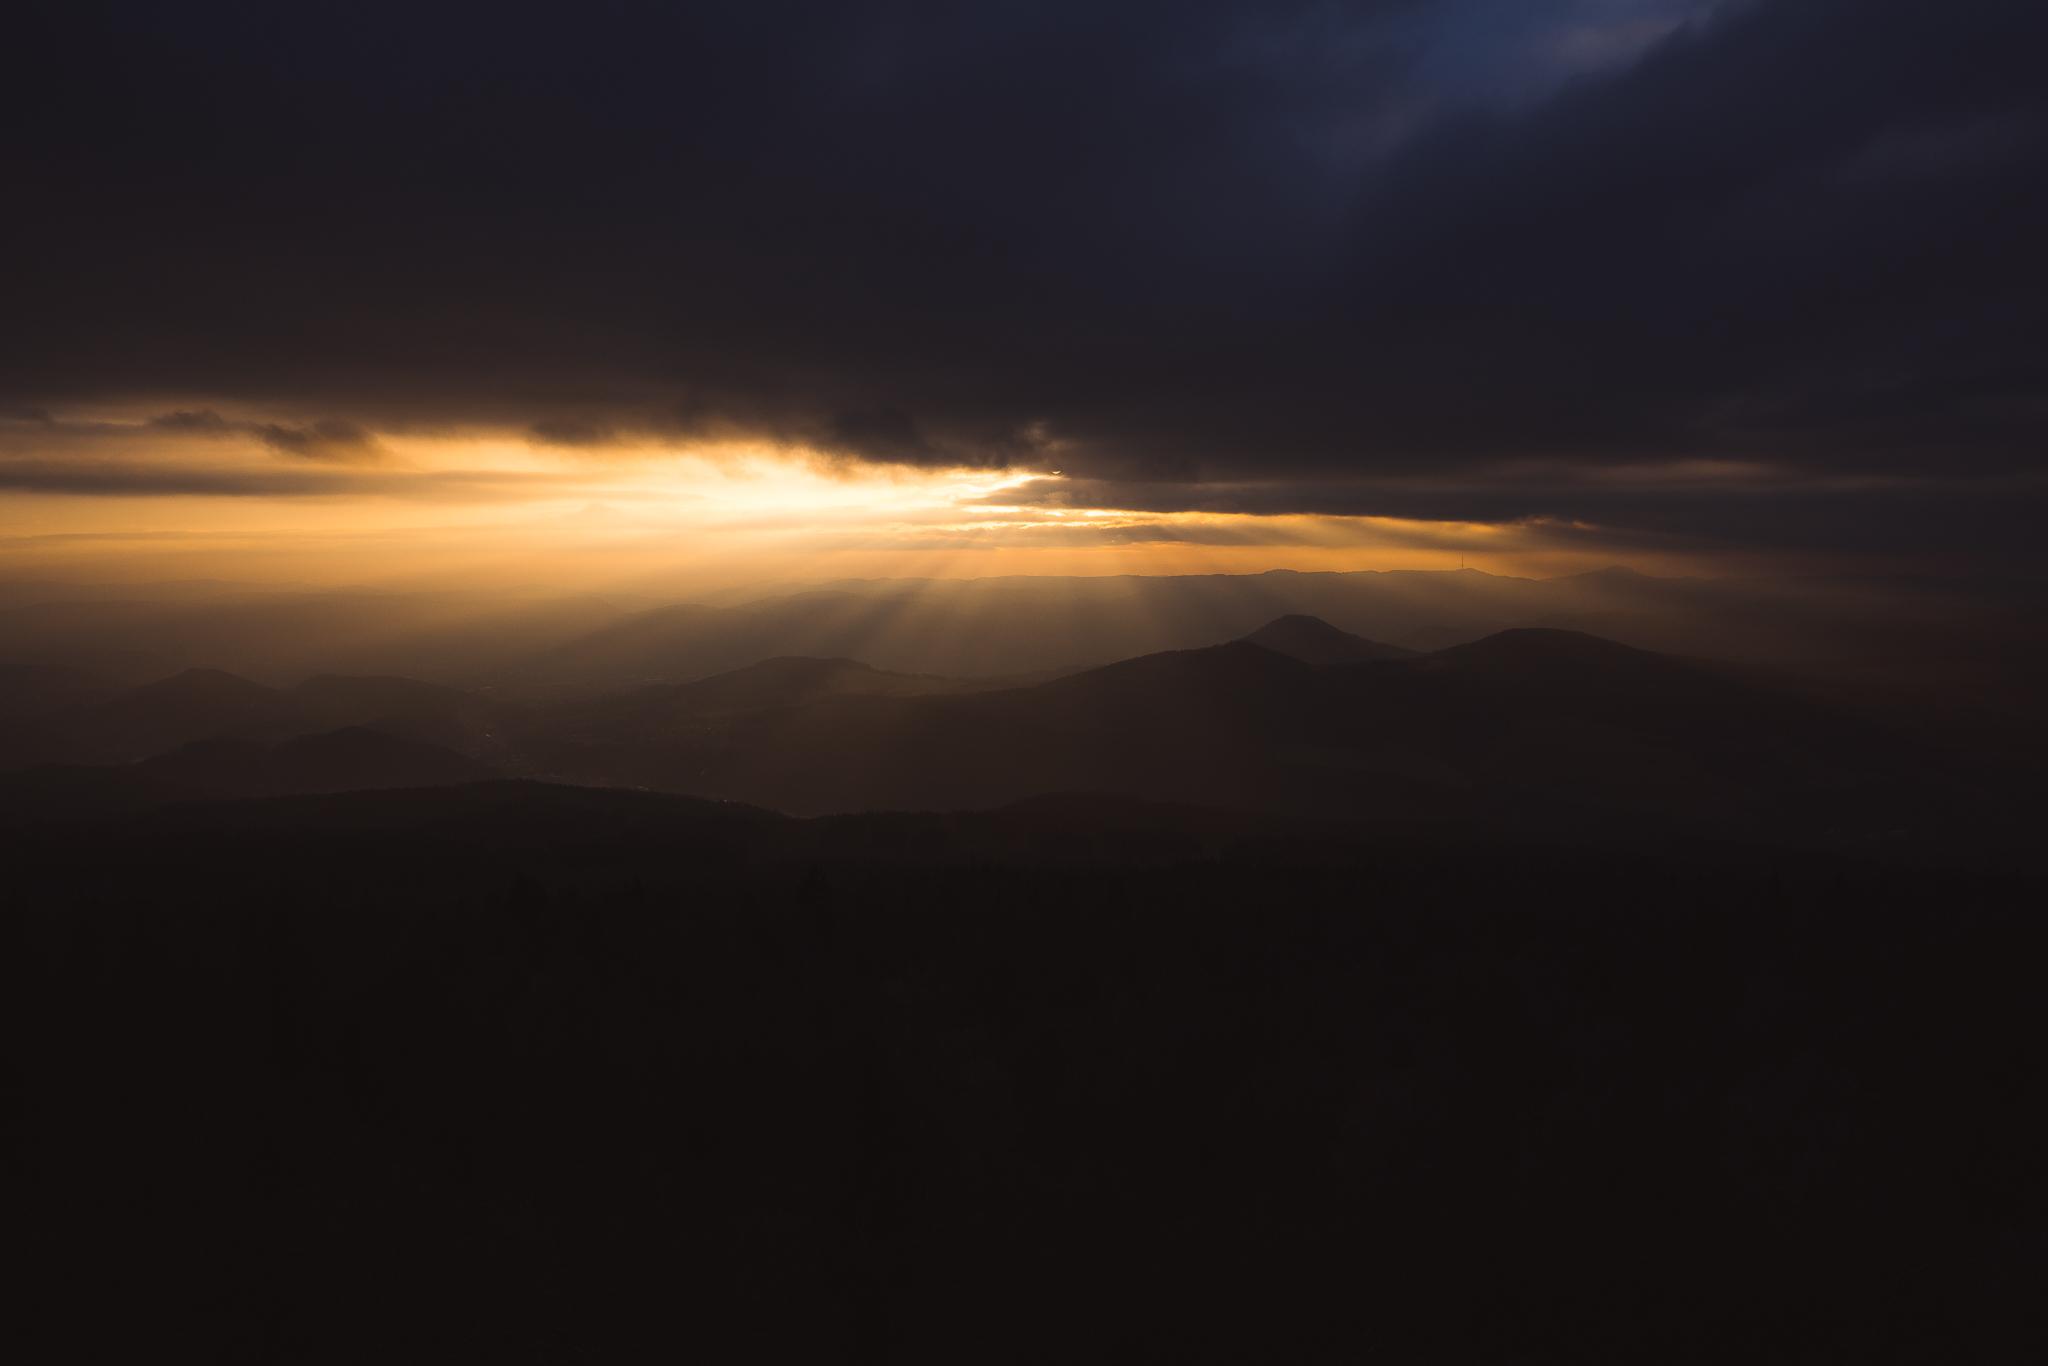 Sunset 02 - 02